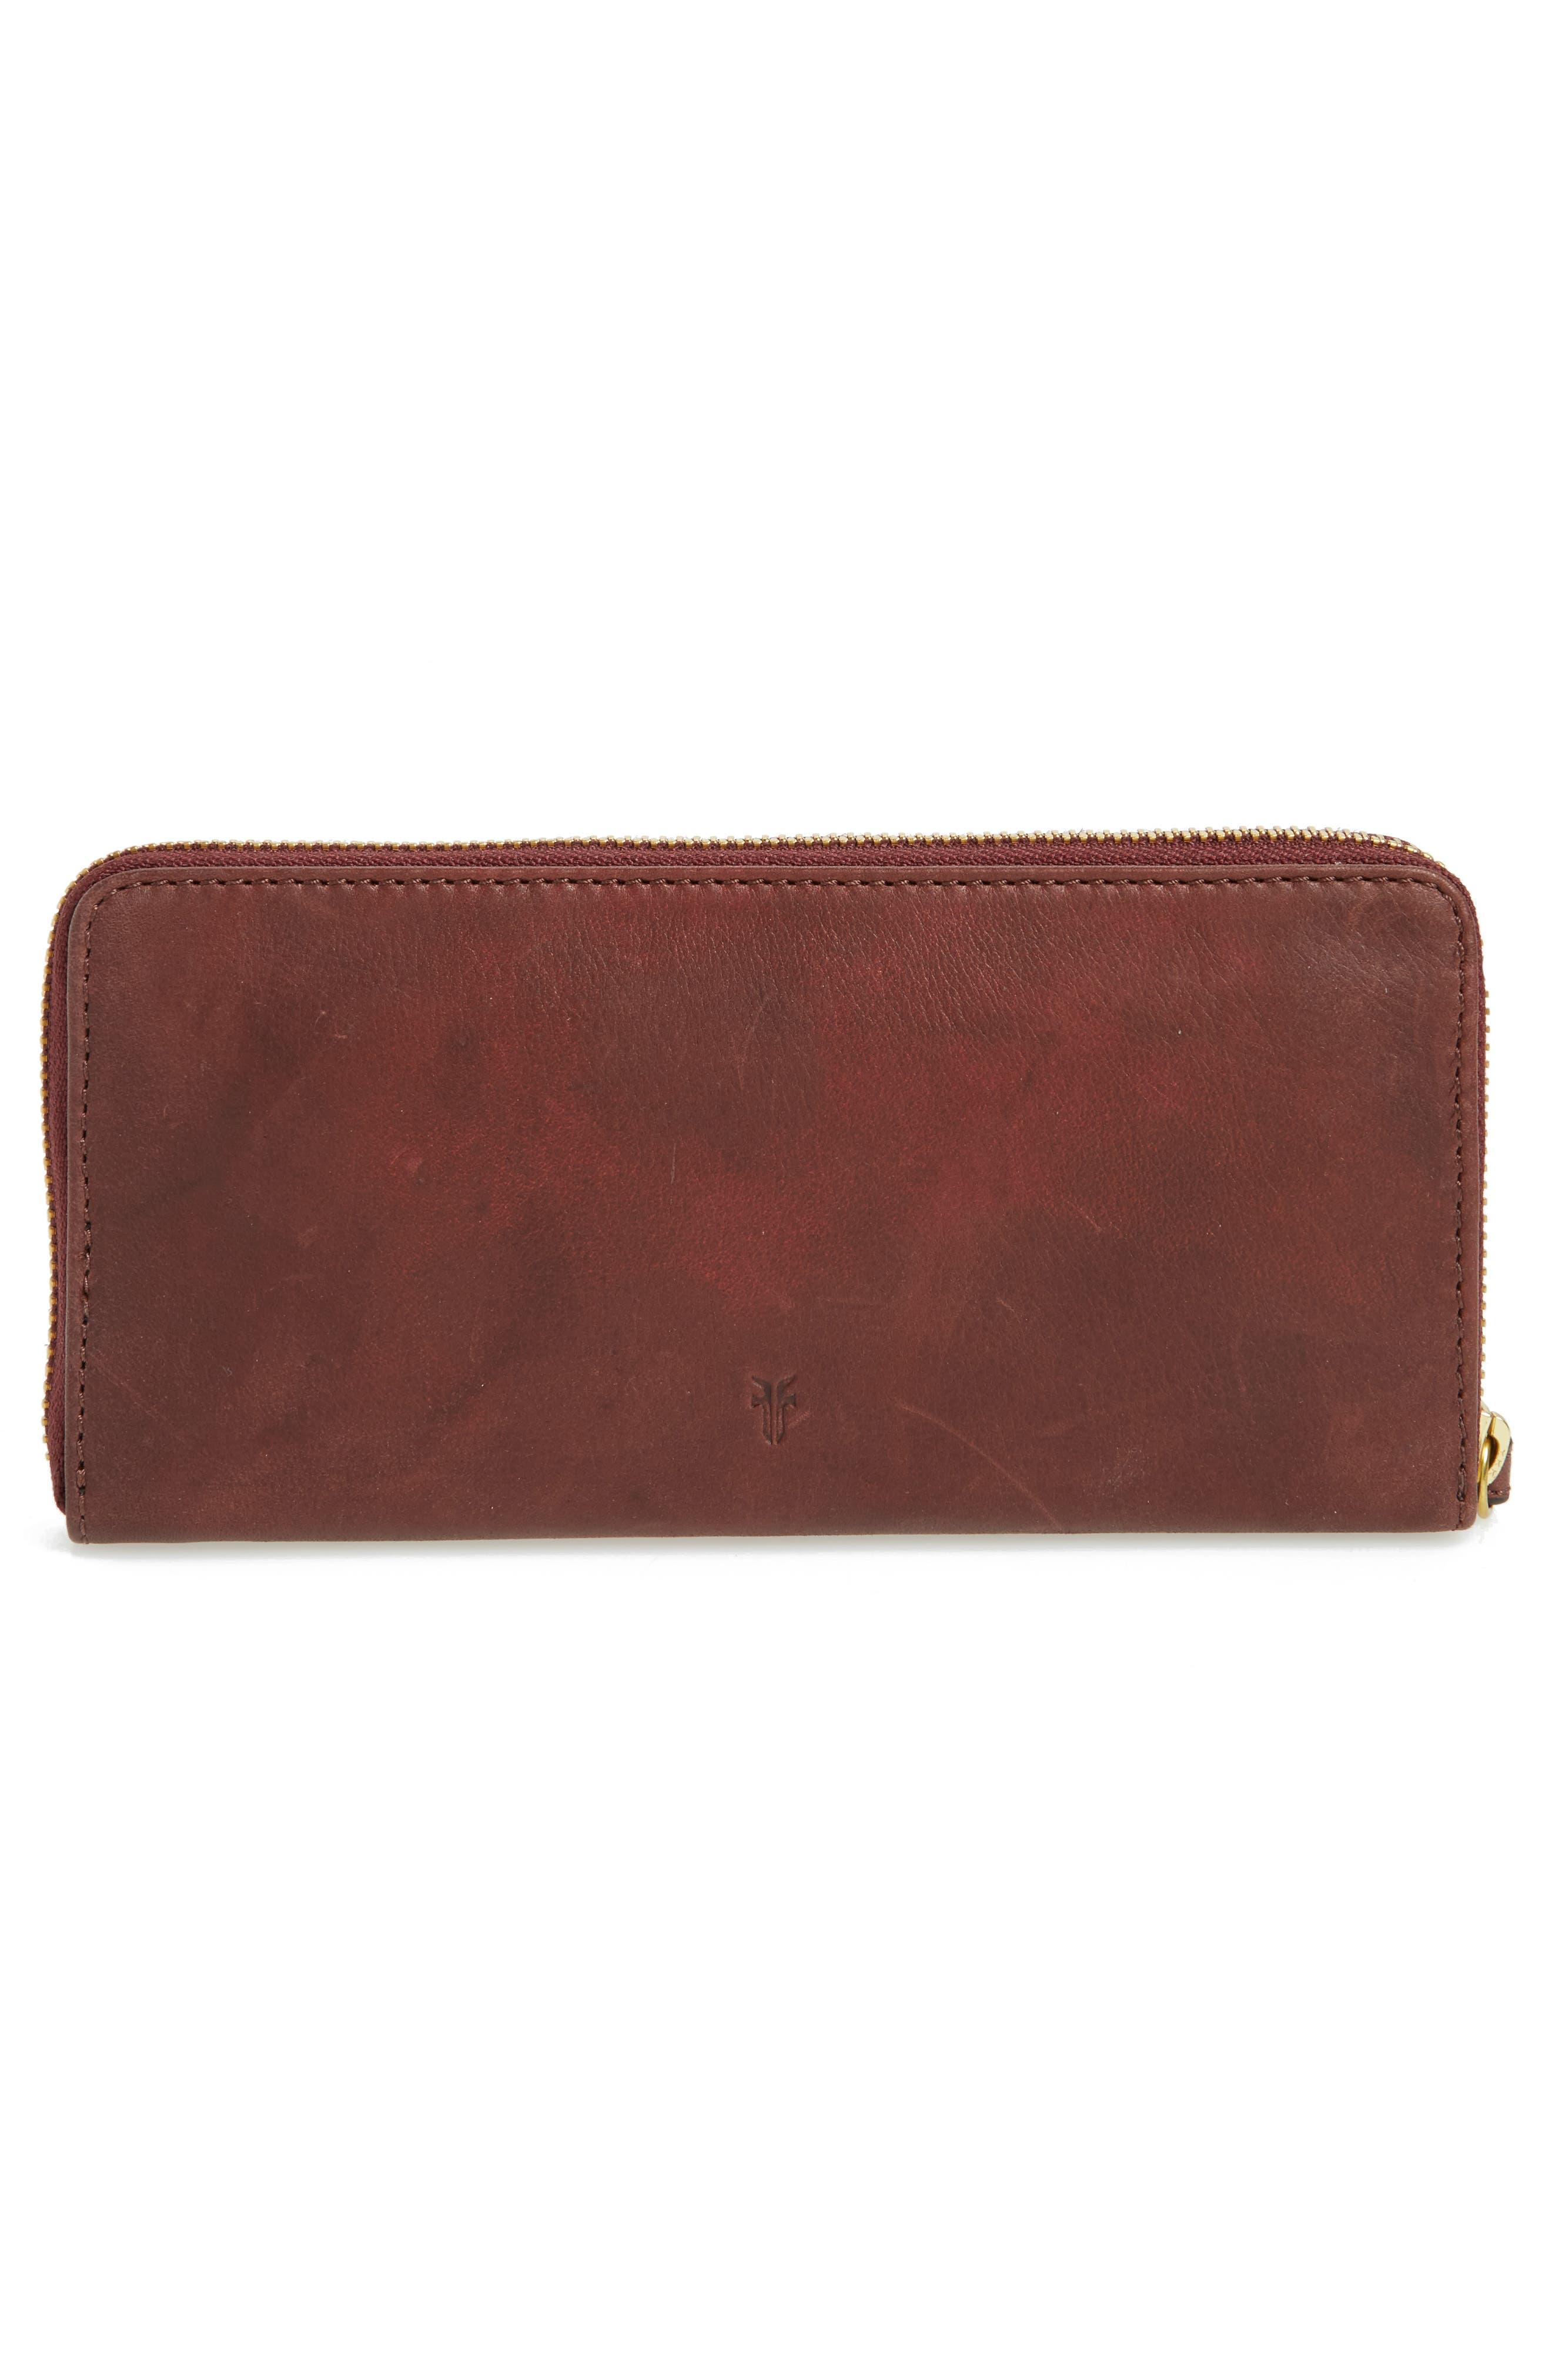 Campus Rivet Leather Continental Zip Wallet,                             Alternate thumbnail 7, color,